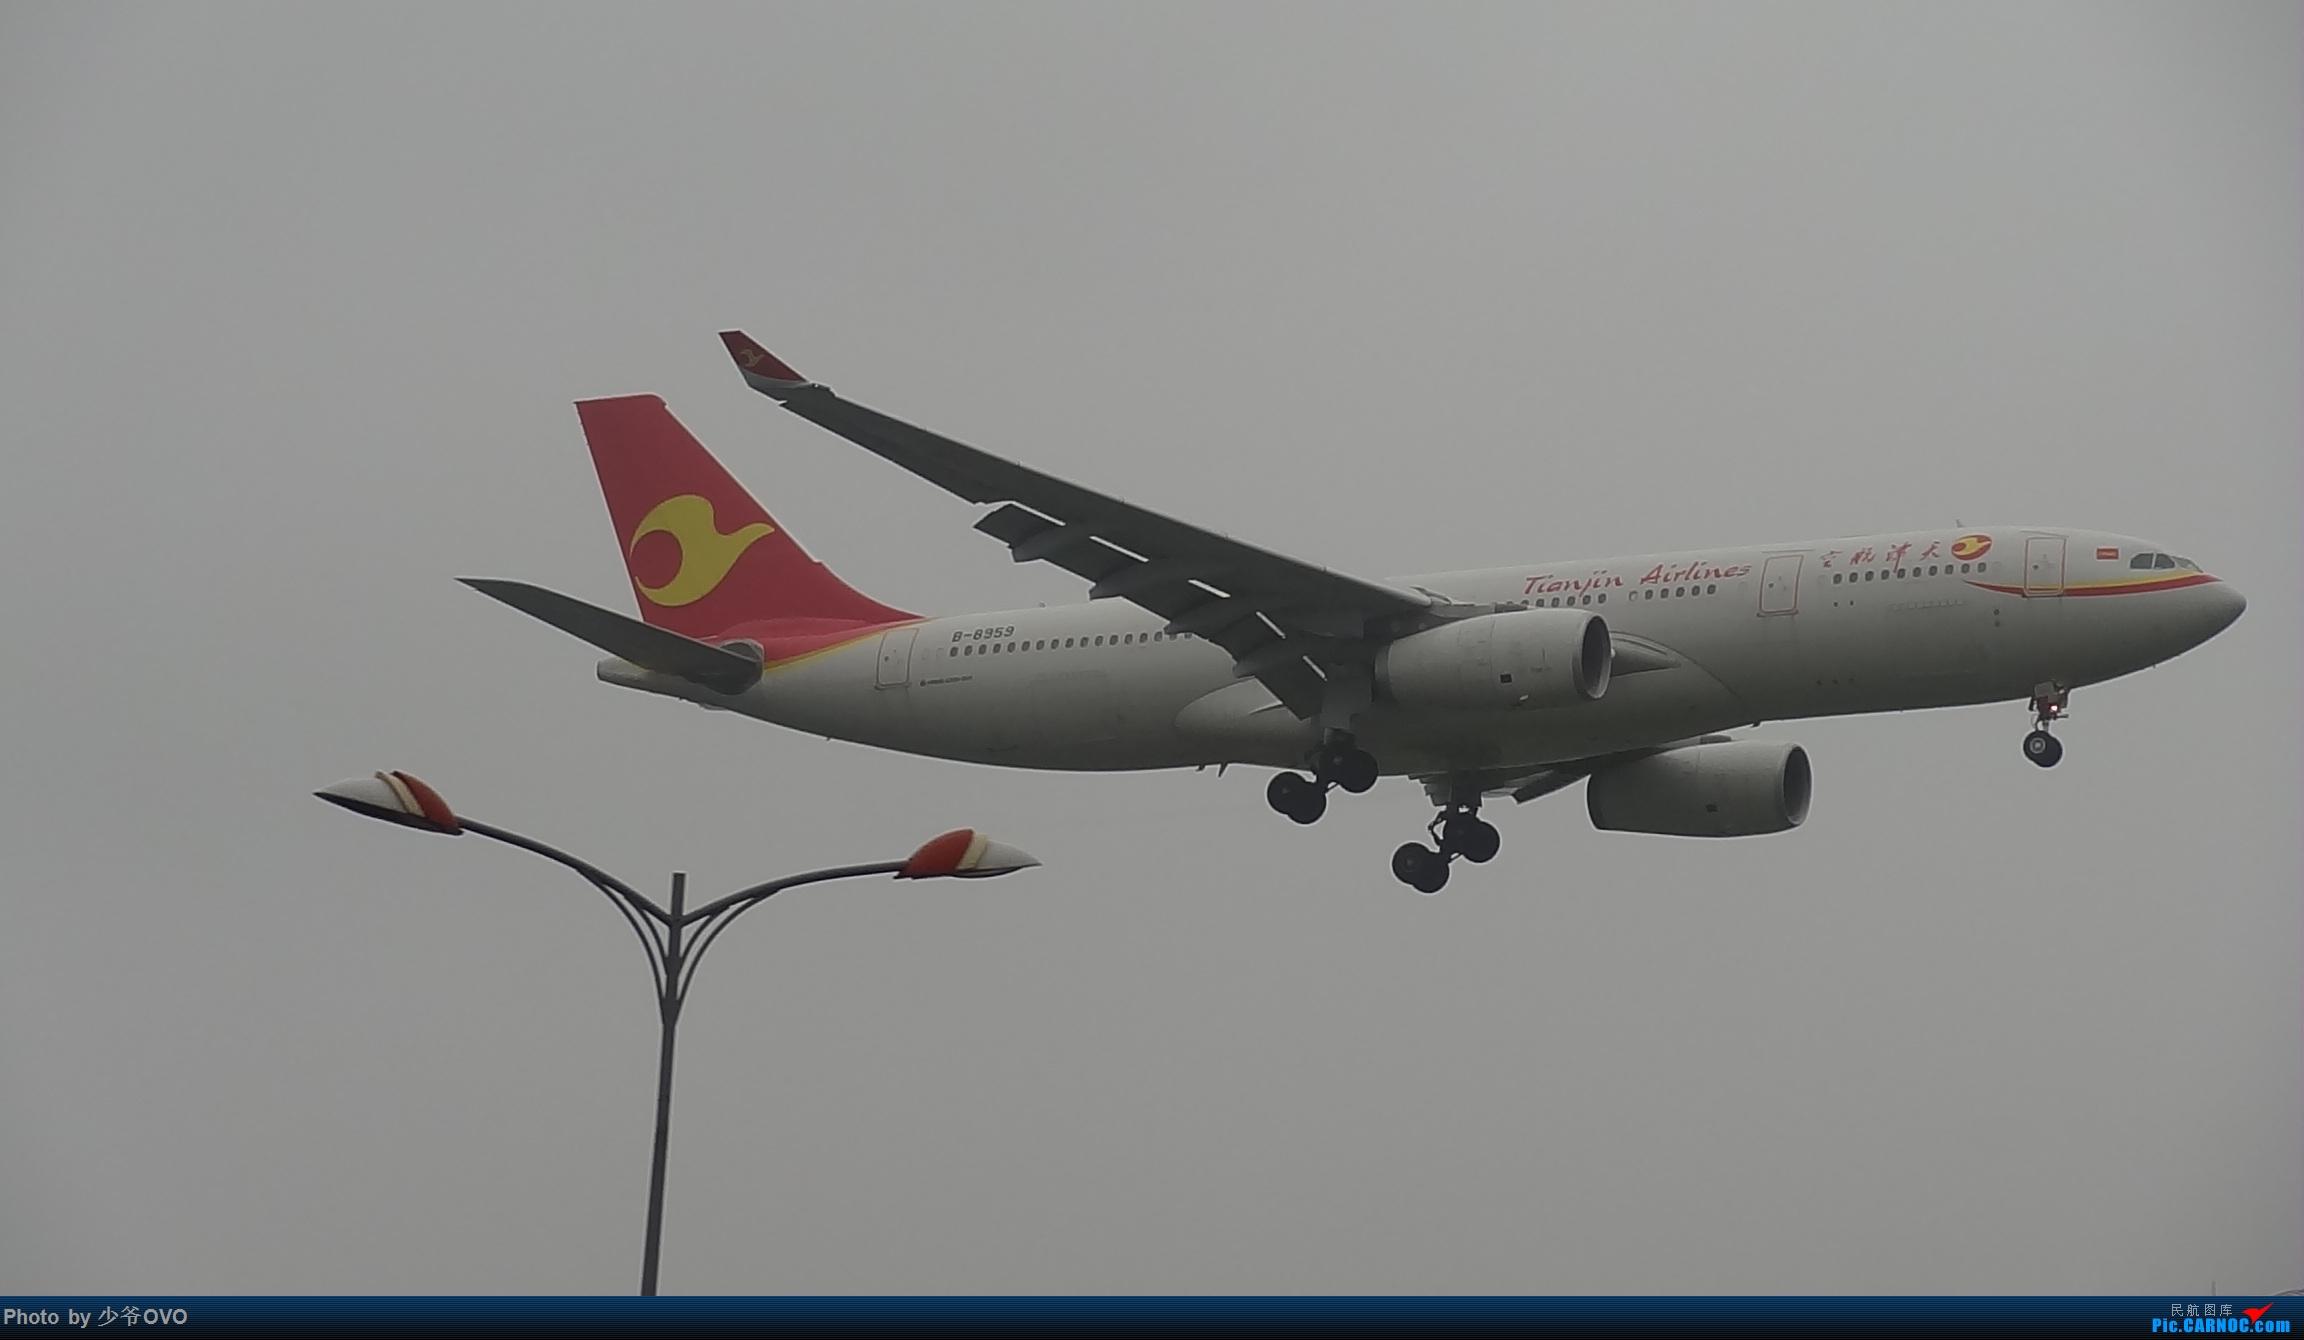 Re:[原创]CKG重庆江北机场拍机 ,渣图一堆,多指点 AIRBUS A330-200 B-8959 中国重庆江北国际机场